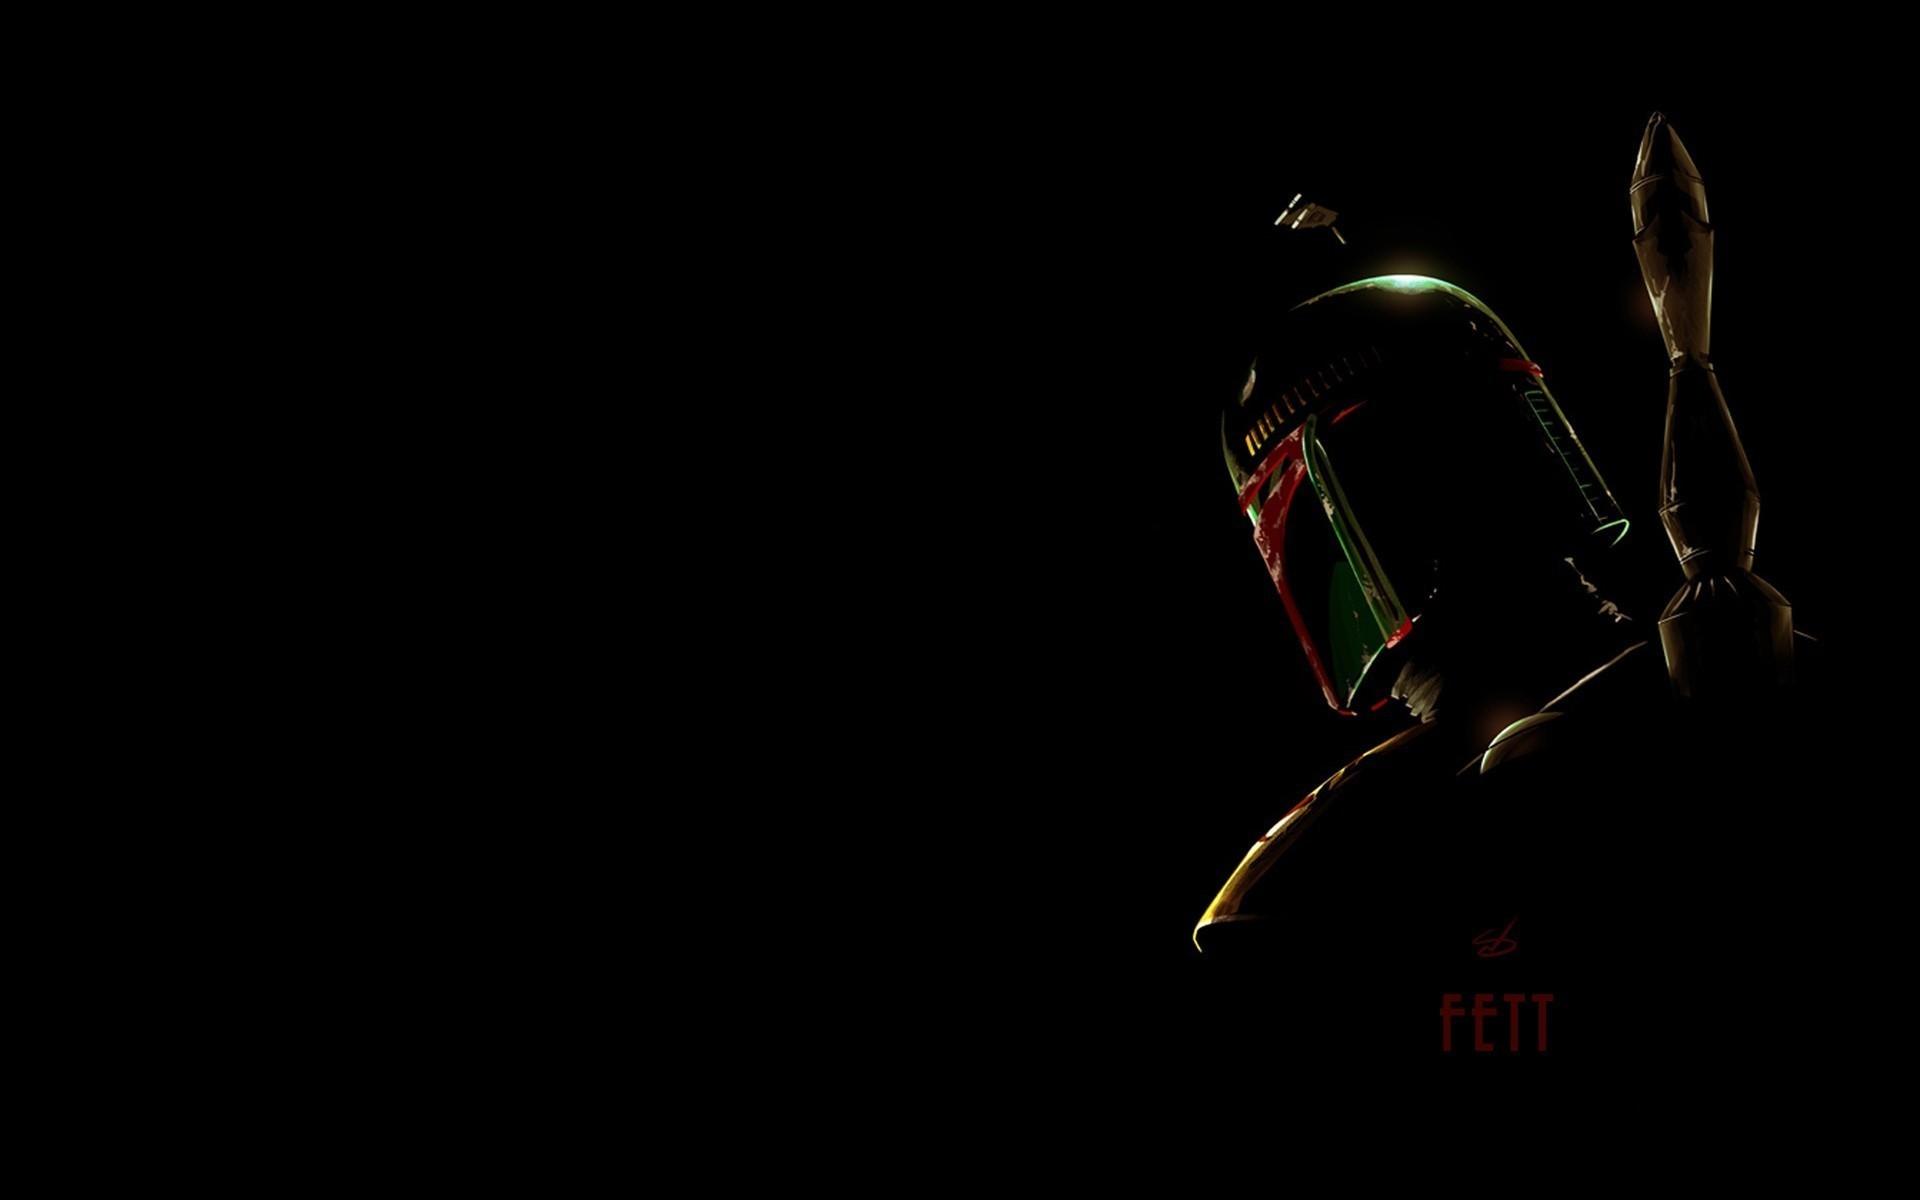 wallpaper Star Wars · silhouettes · Boba Fett